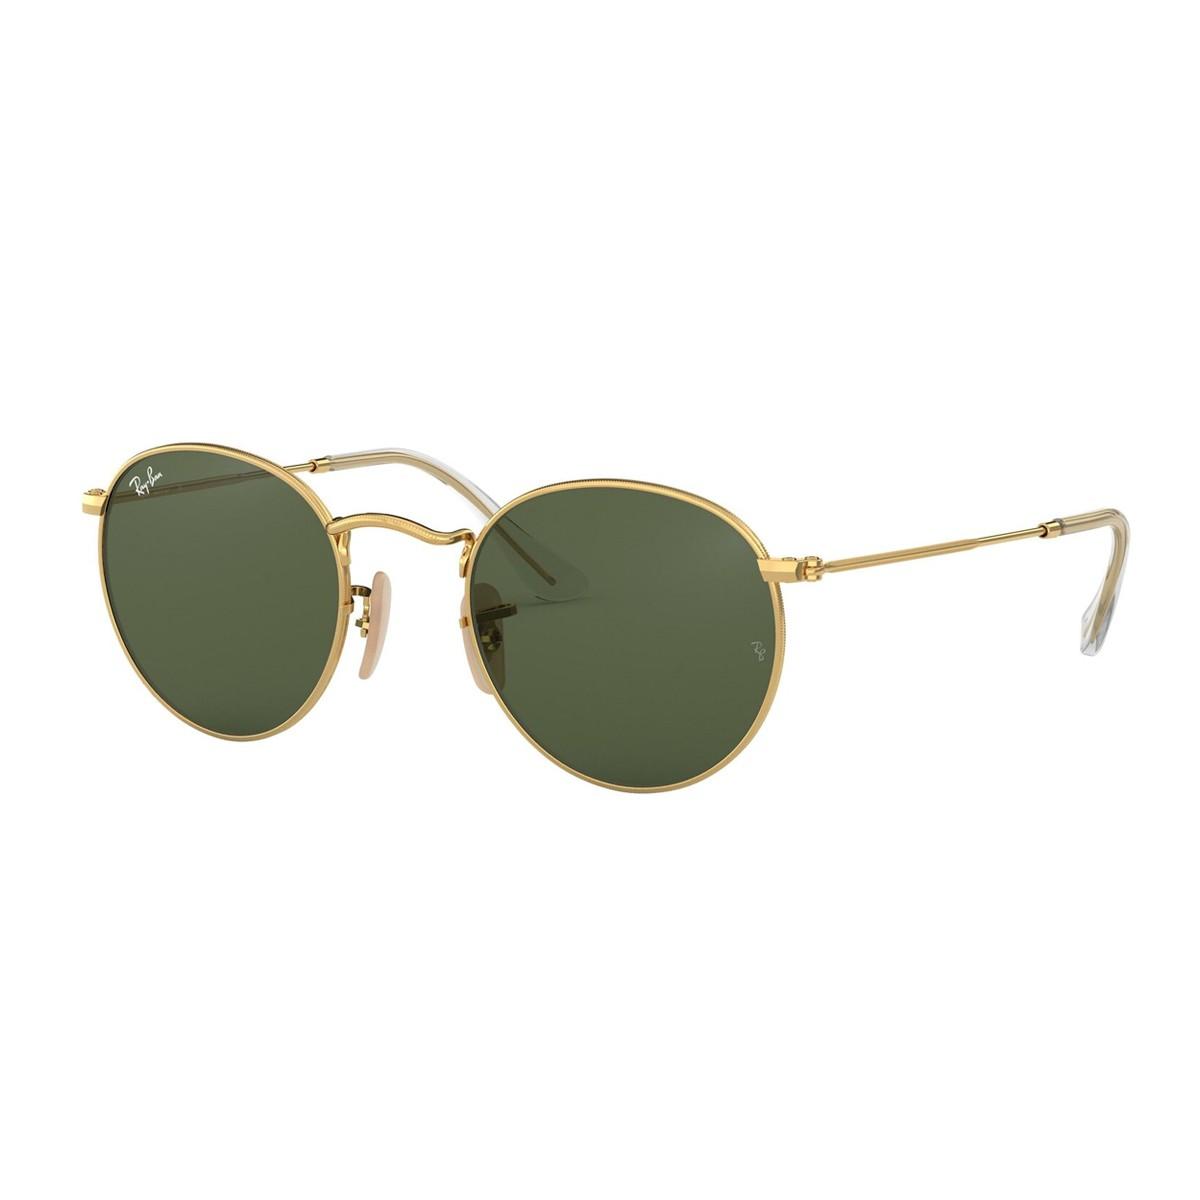 Ray-Ban ROUND METAL RB 3447 | Unisex sunglasses